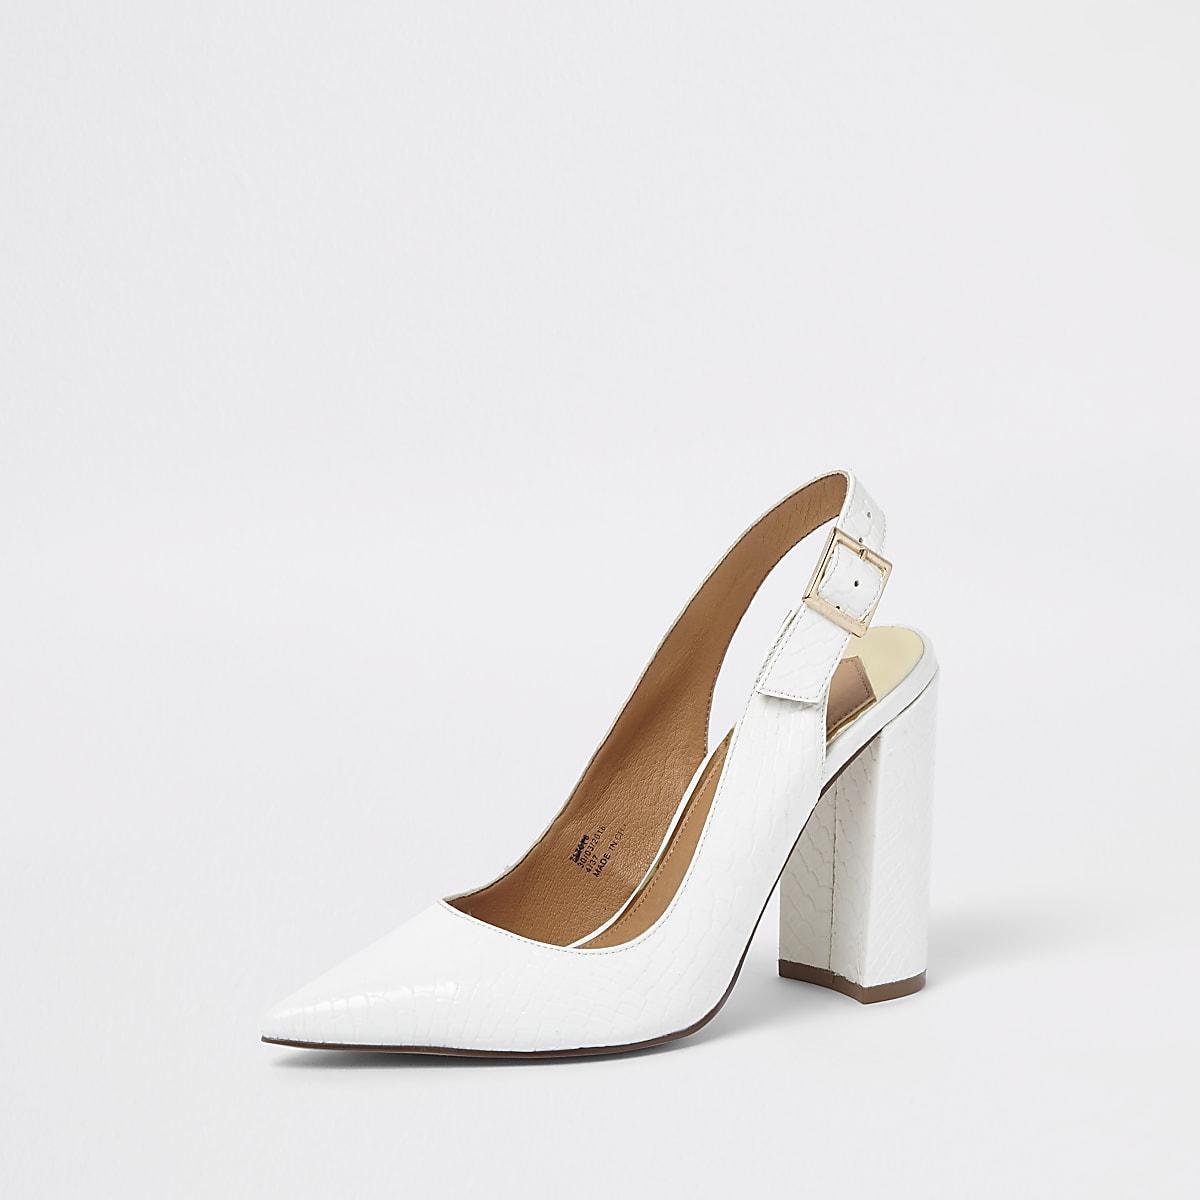 46905e9c2c241b Weiße Pumps mit Fersenriemen - Schuhe - Schuhe   Stiefel - Damen